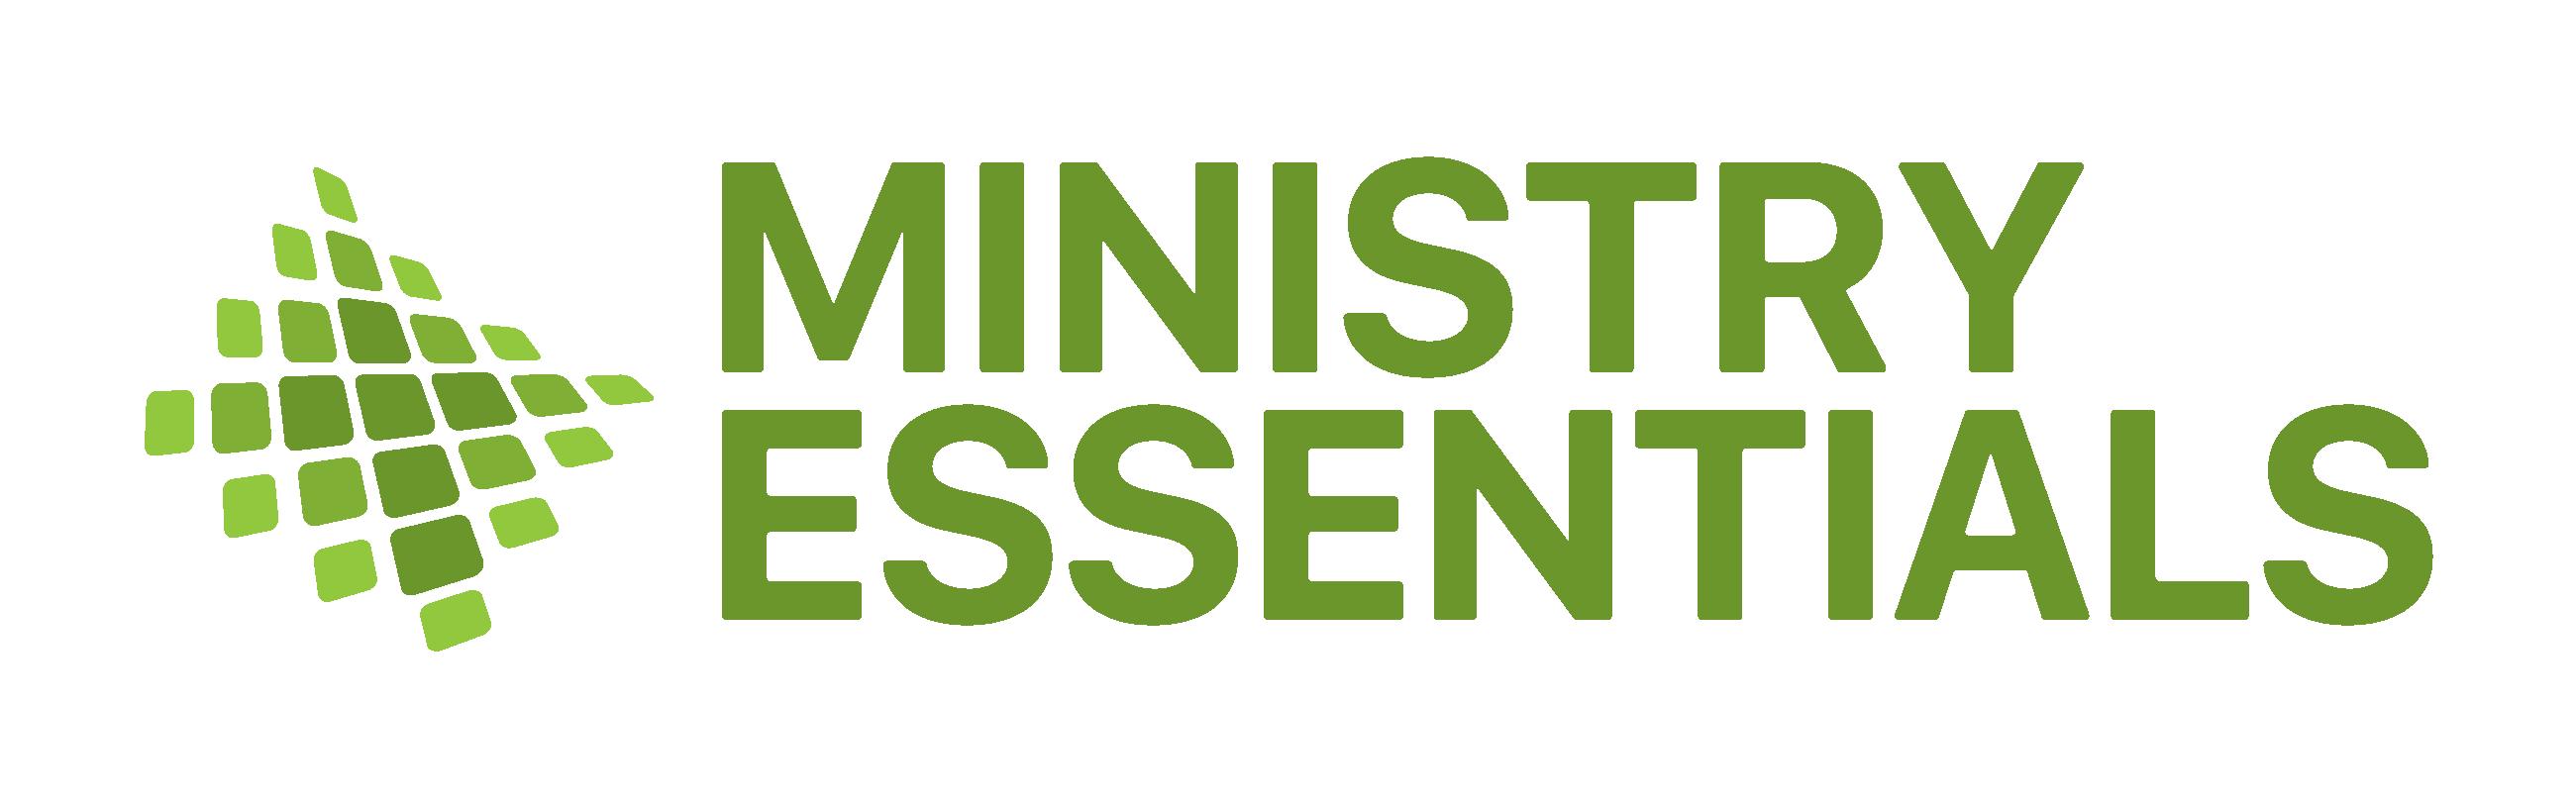 Ministry Essentials